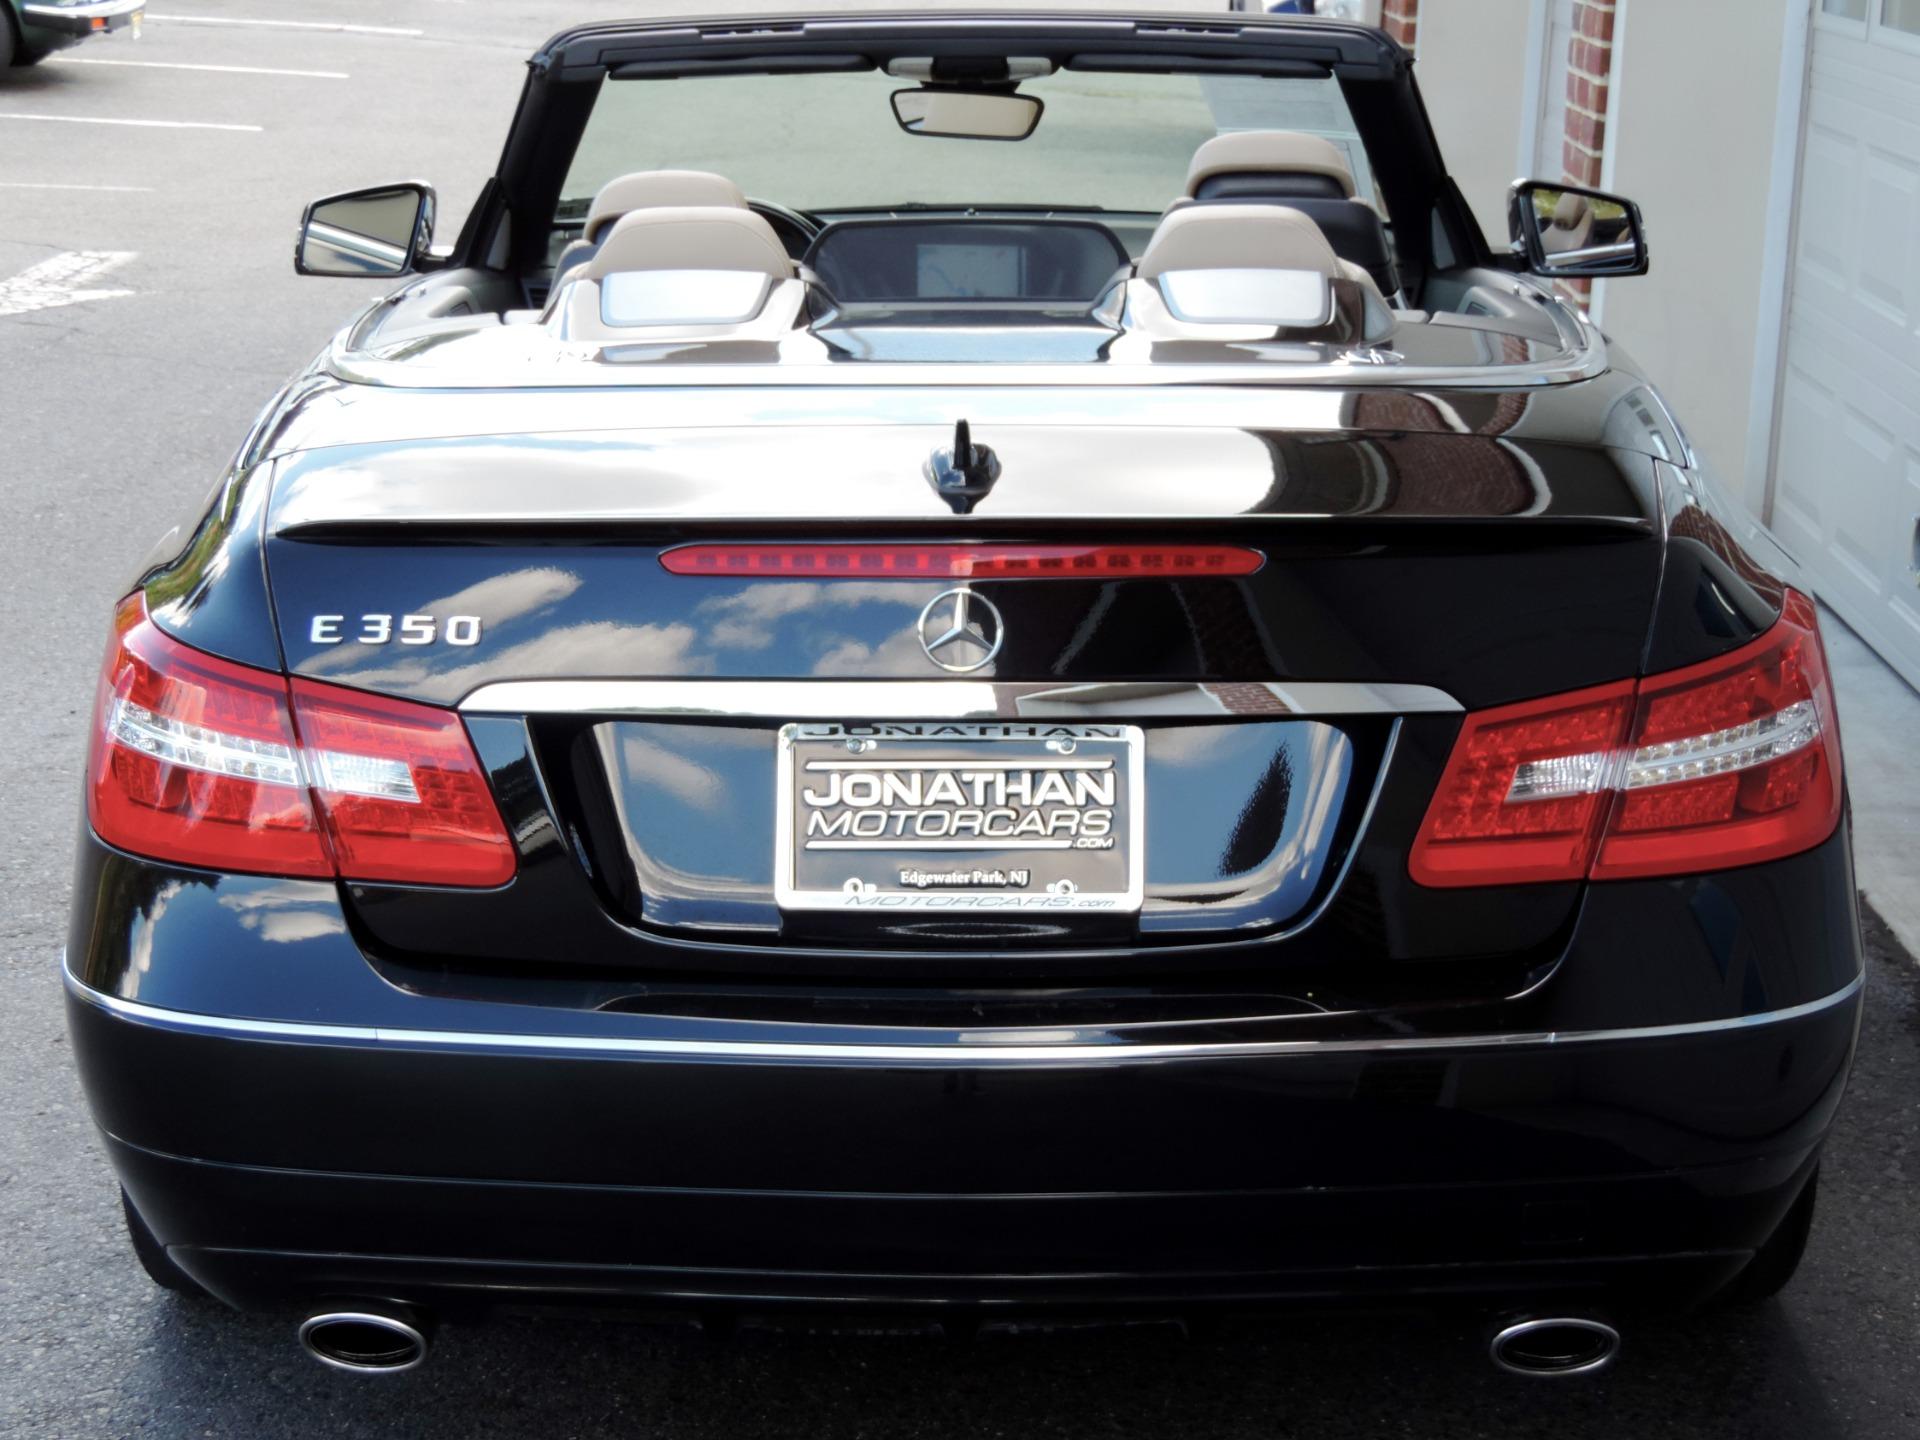 Used-2013-Mercedes-Benz-E-Class-E-350-Convertible--Sport-Edition--Navigation